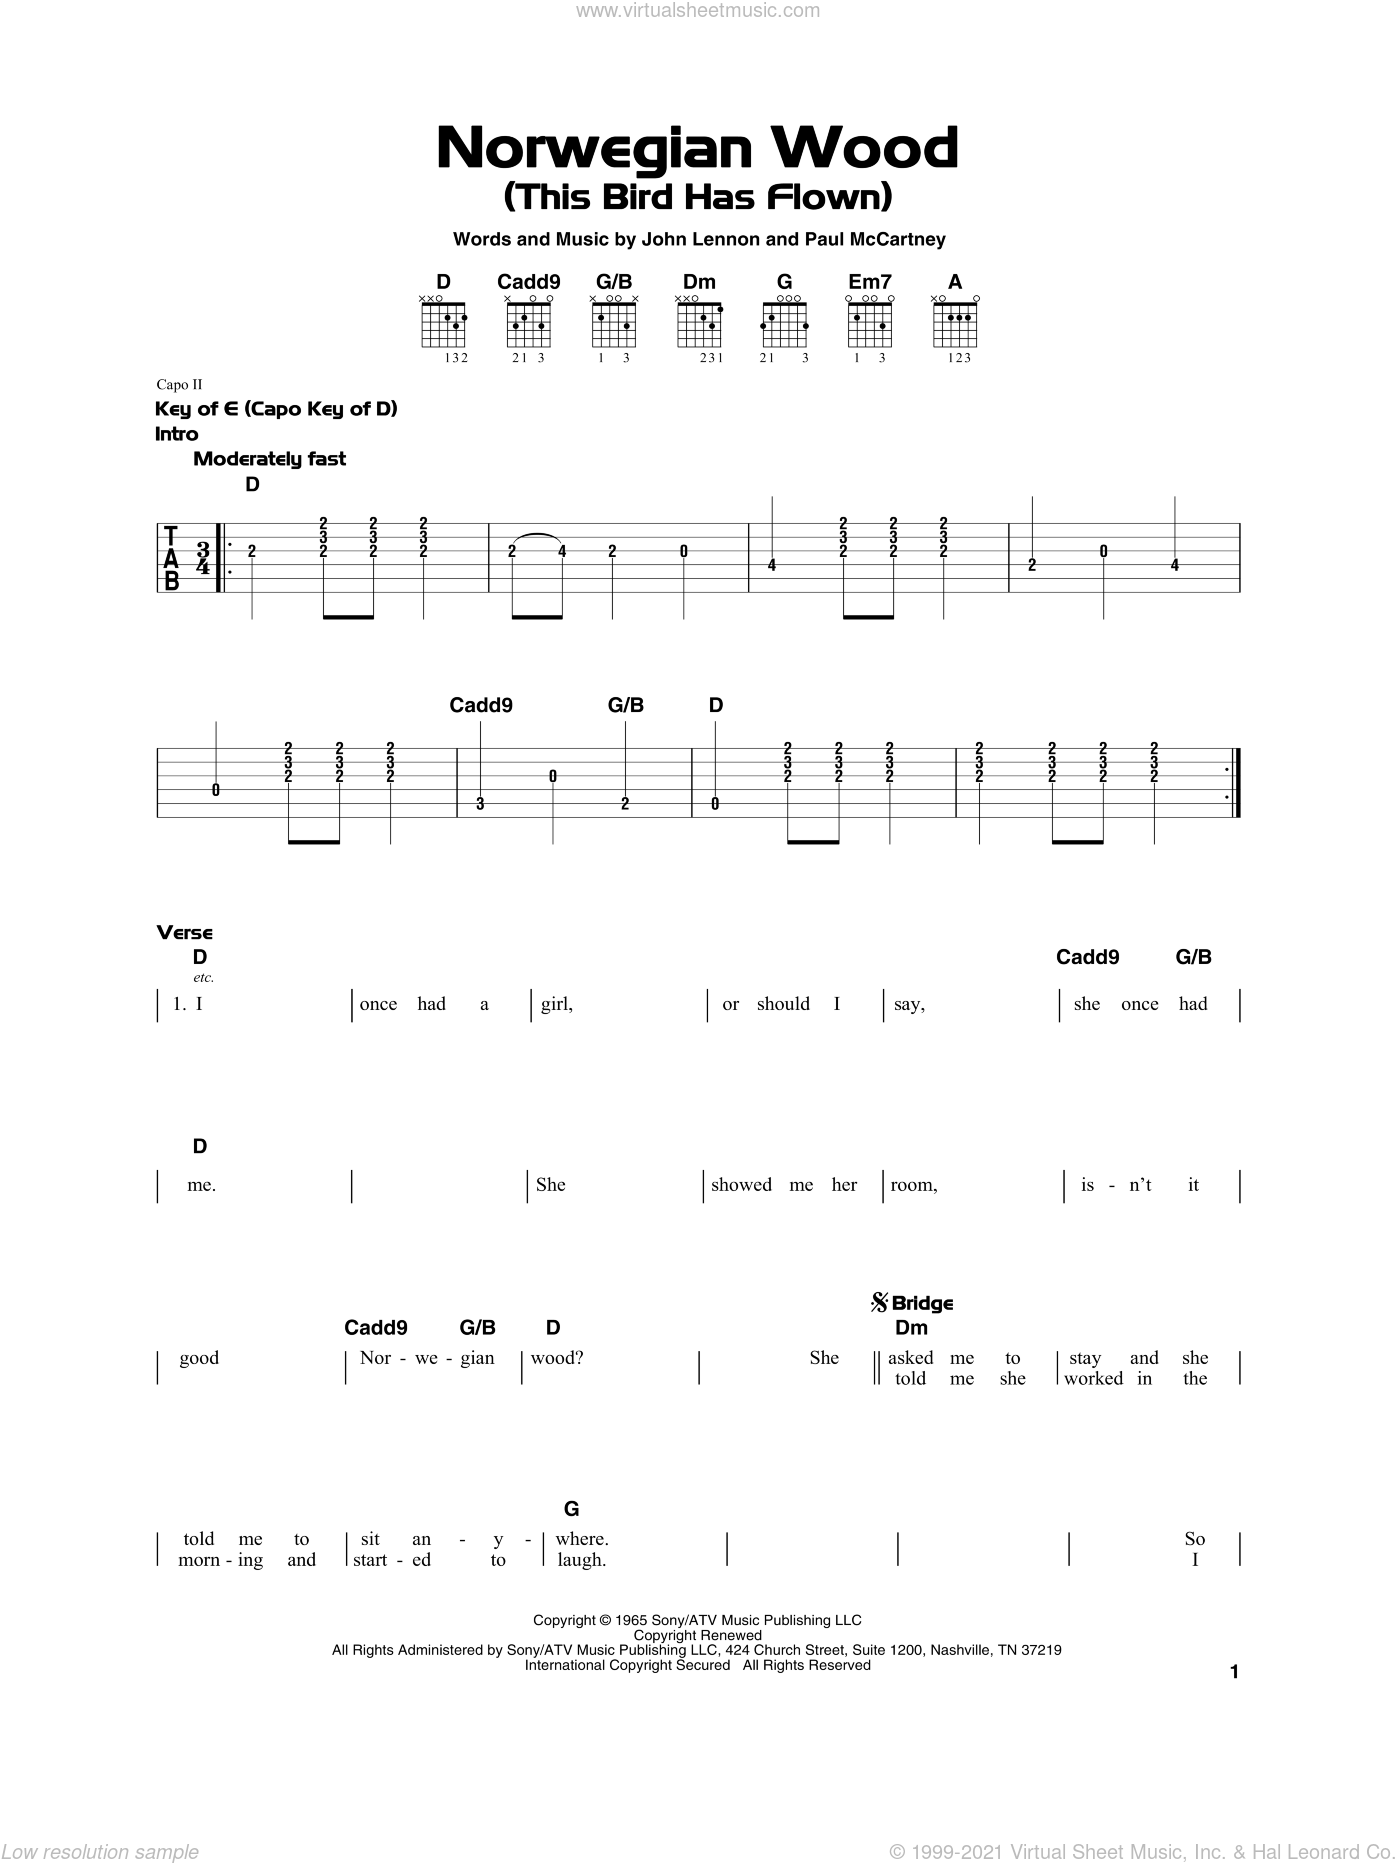 Norwegian Wood (This Bird Has Flown) sheet music for guitar solo by The Beatles, John Lennon and Paul McCartney, beginner skill level